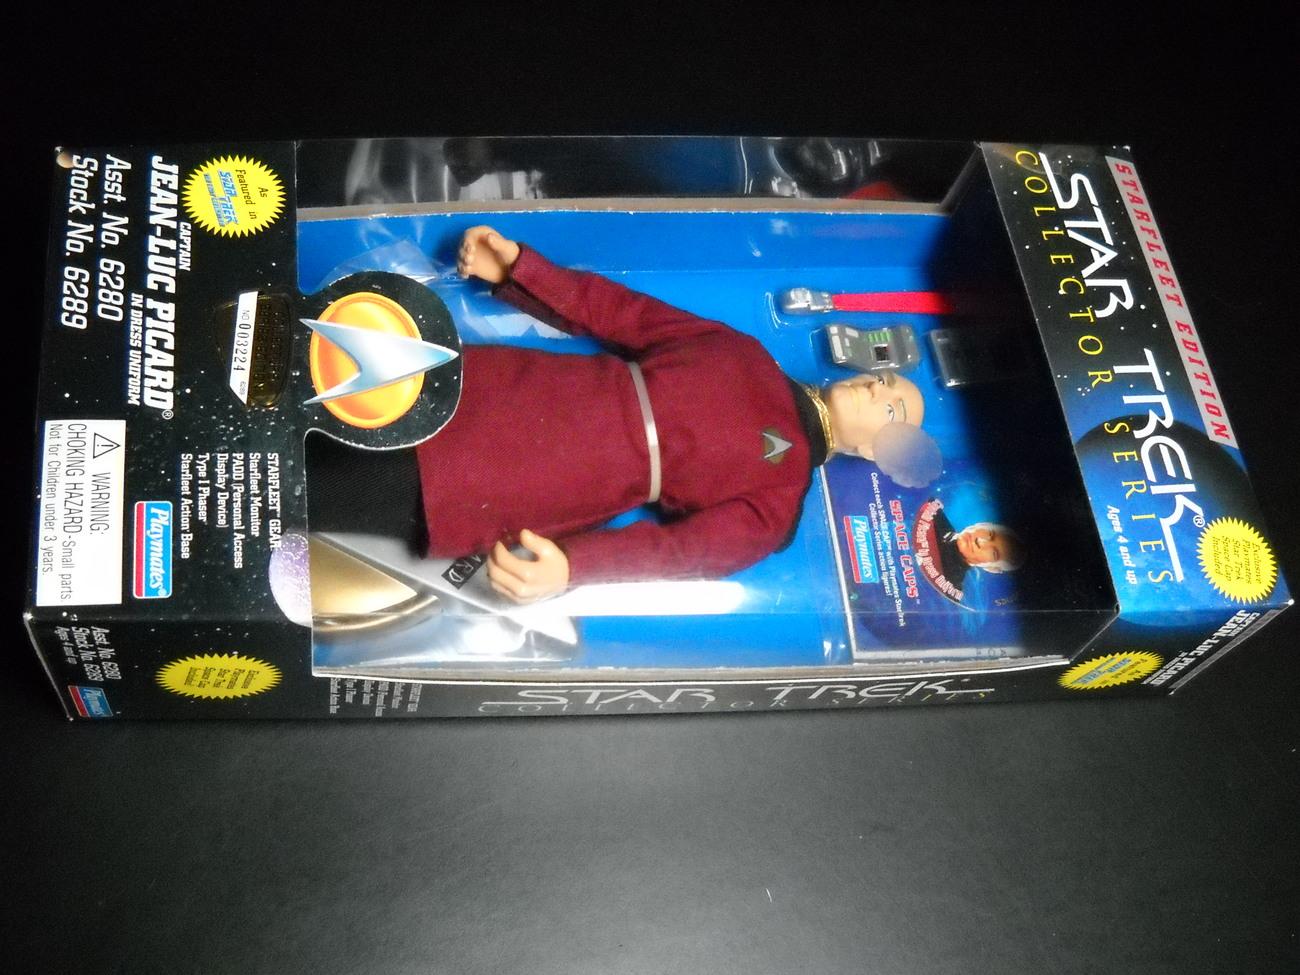 Toy star trek playmates starfleet edition captain jean luc picard in dress uniform 1995 9 inch boxed sealed 01